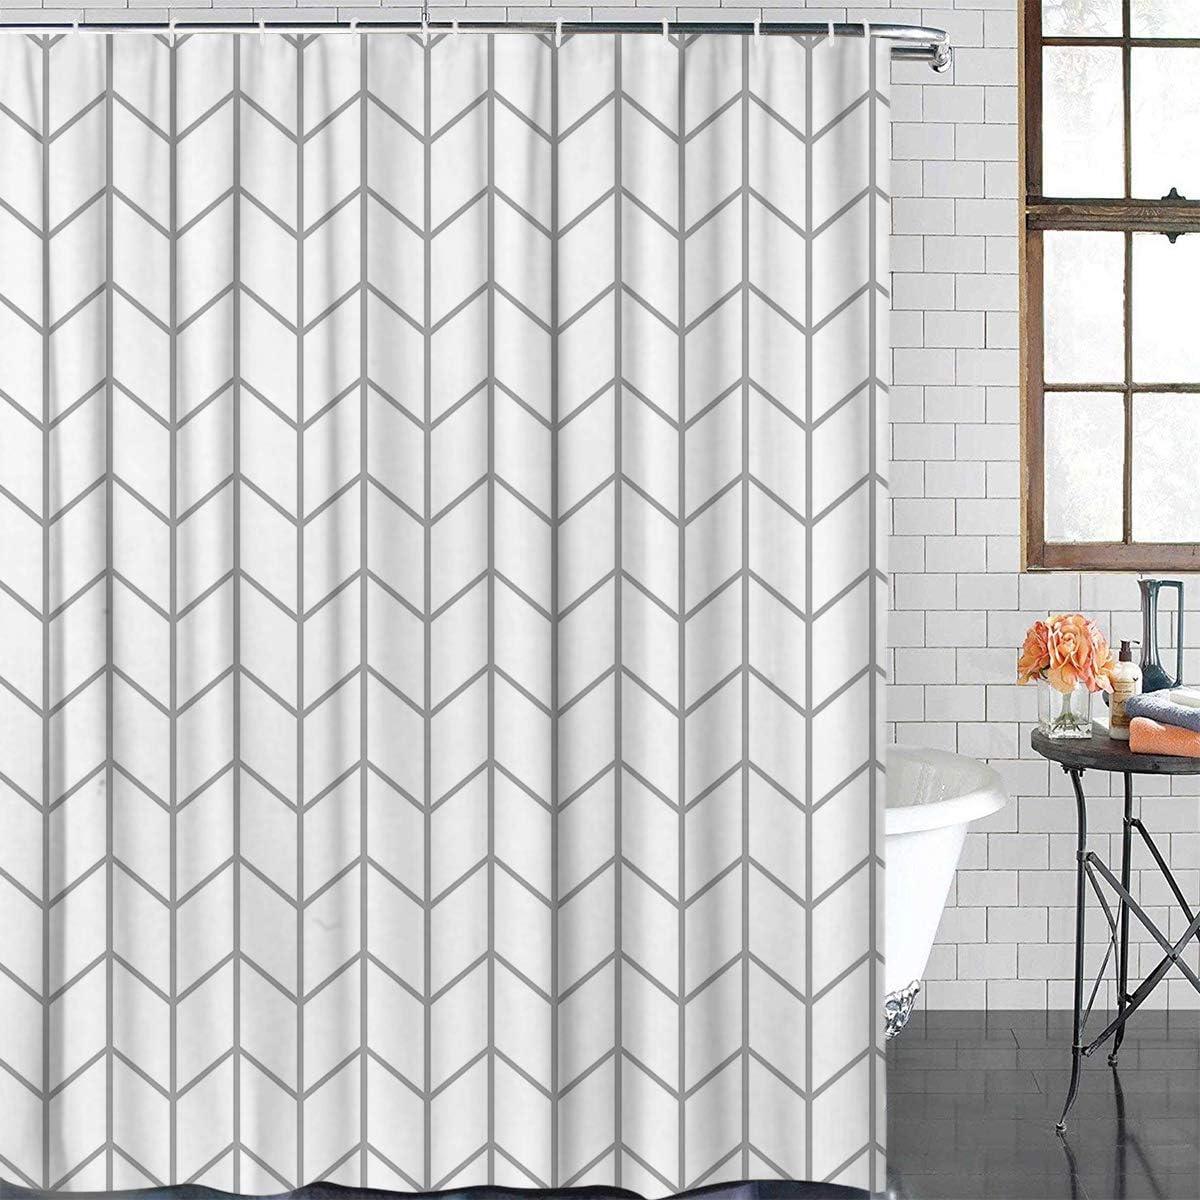 Popular Elegant Geometric Shower Curtains Challenge the lowest price Herringbone Fabric Polyester B